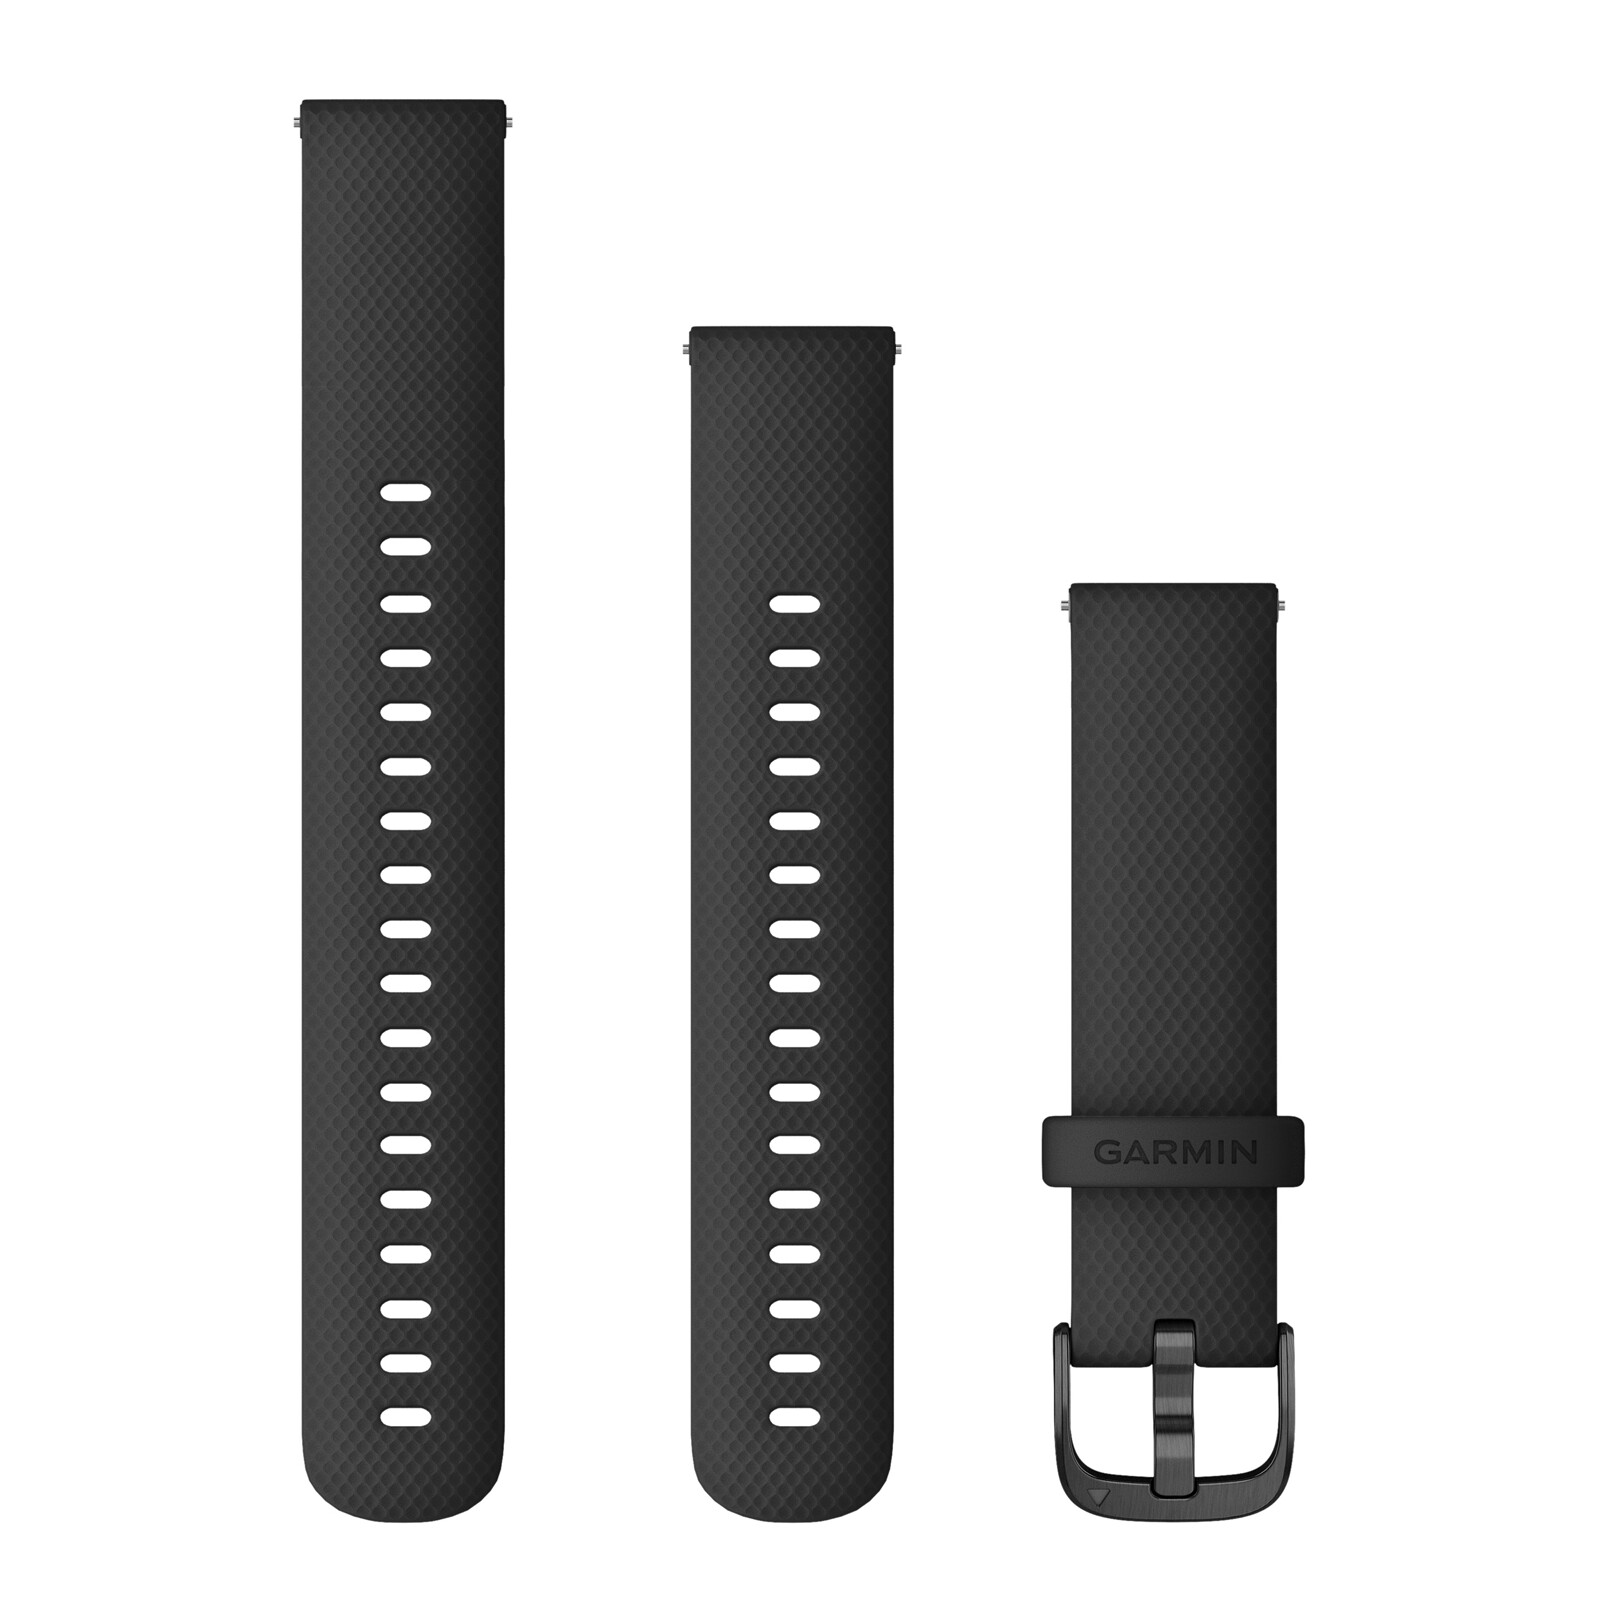 Garmin Schnellwechsel Armband Silikon 18mm Schwarz